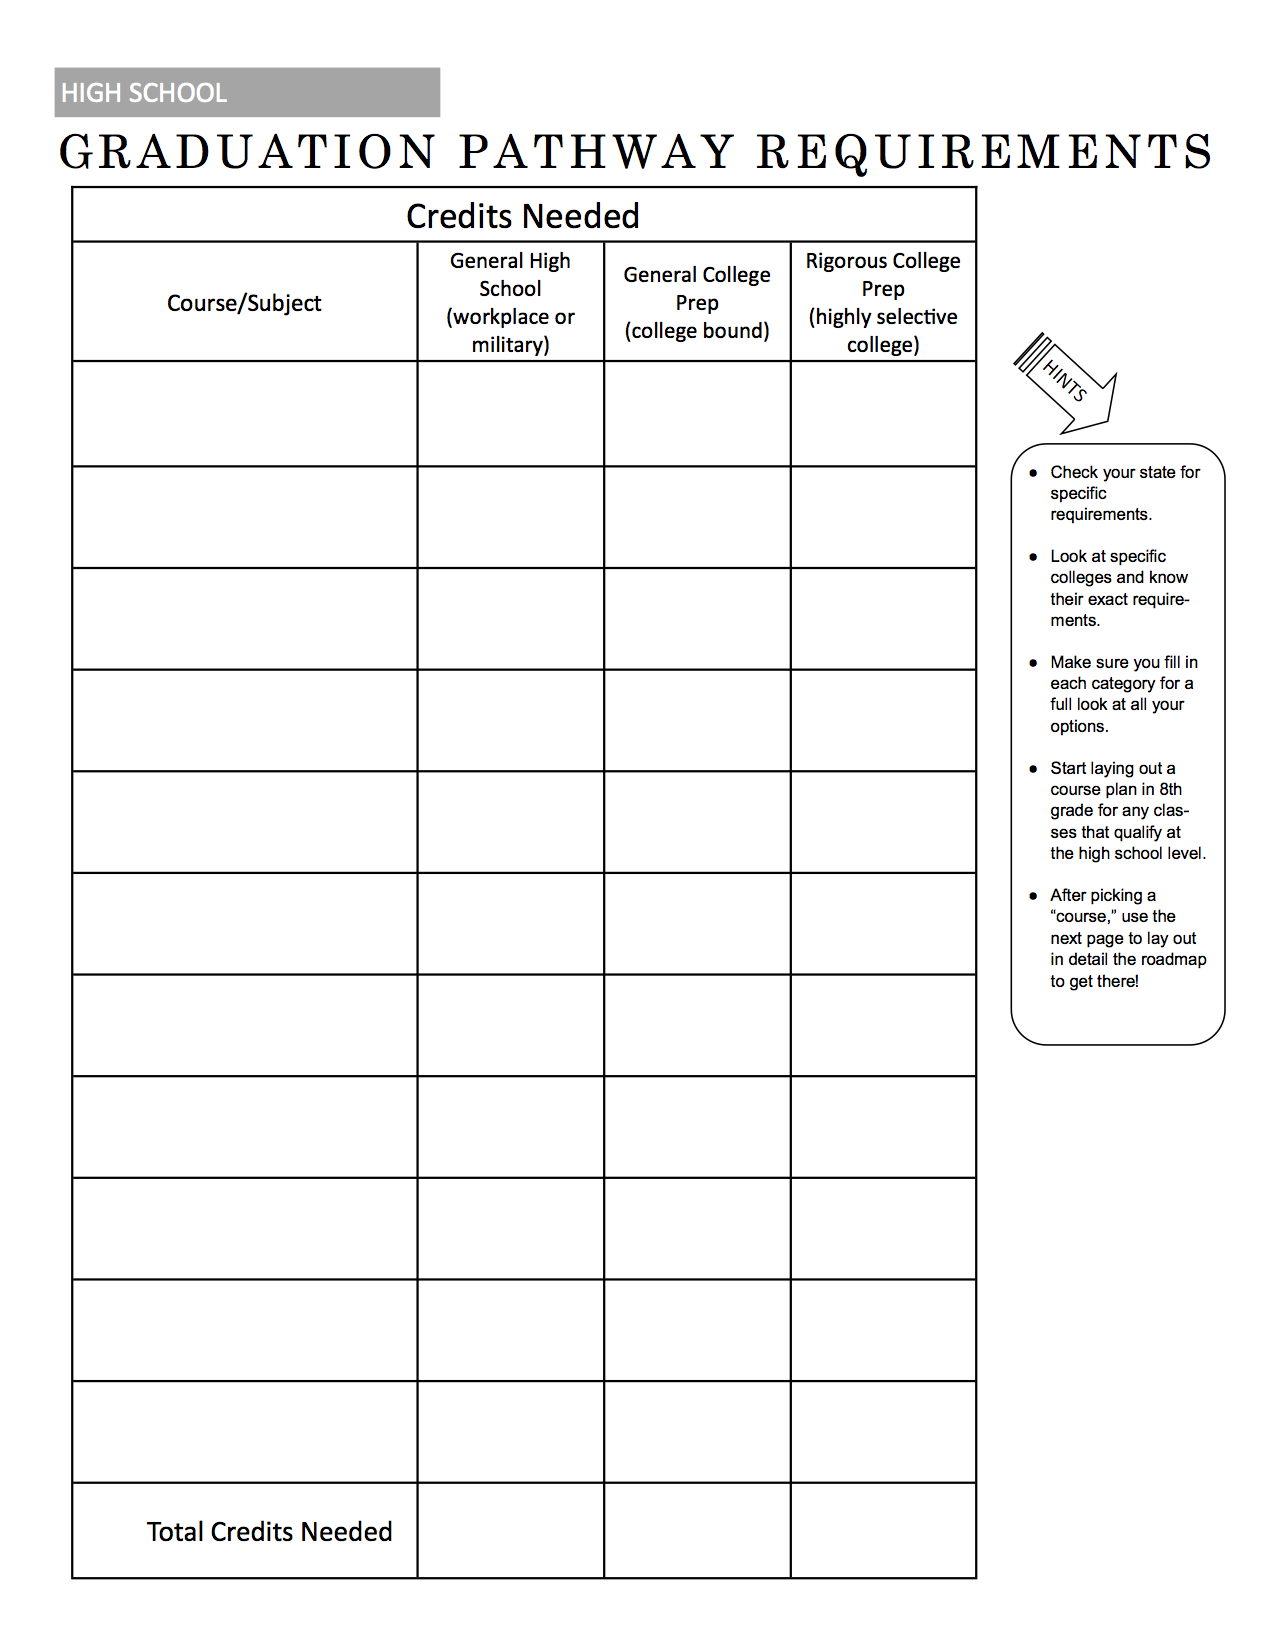 image regarding School Planner Printable titled Superior Higher education Model - A Software inside Area